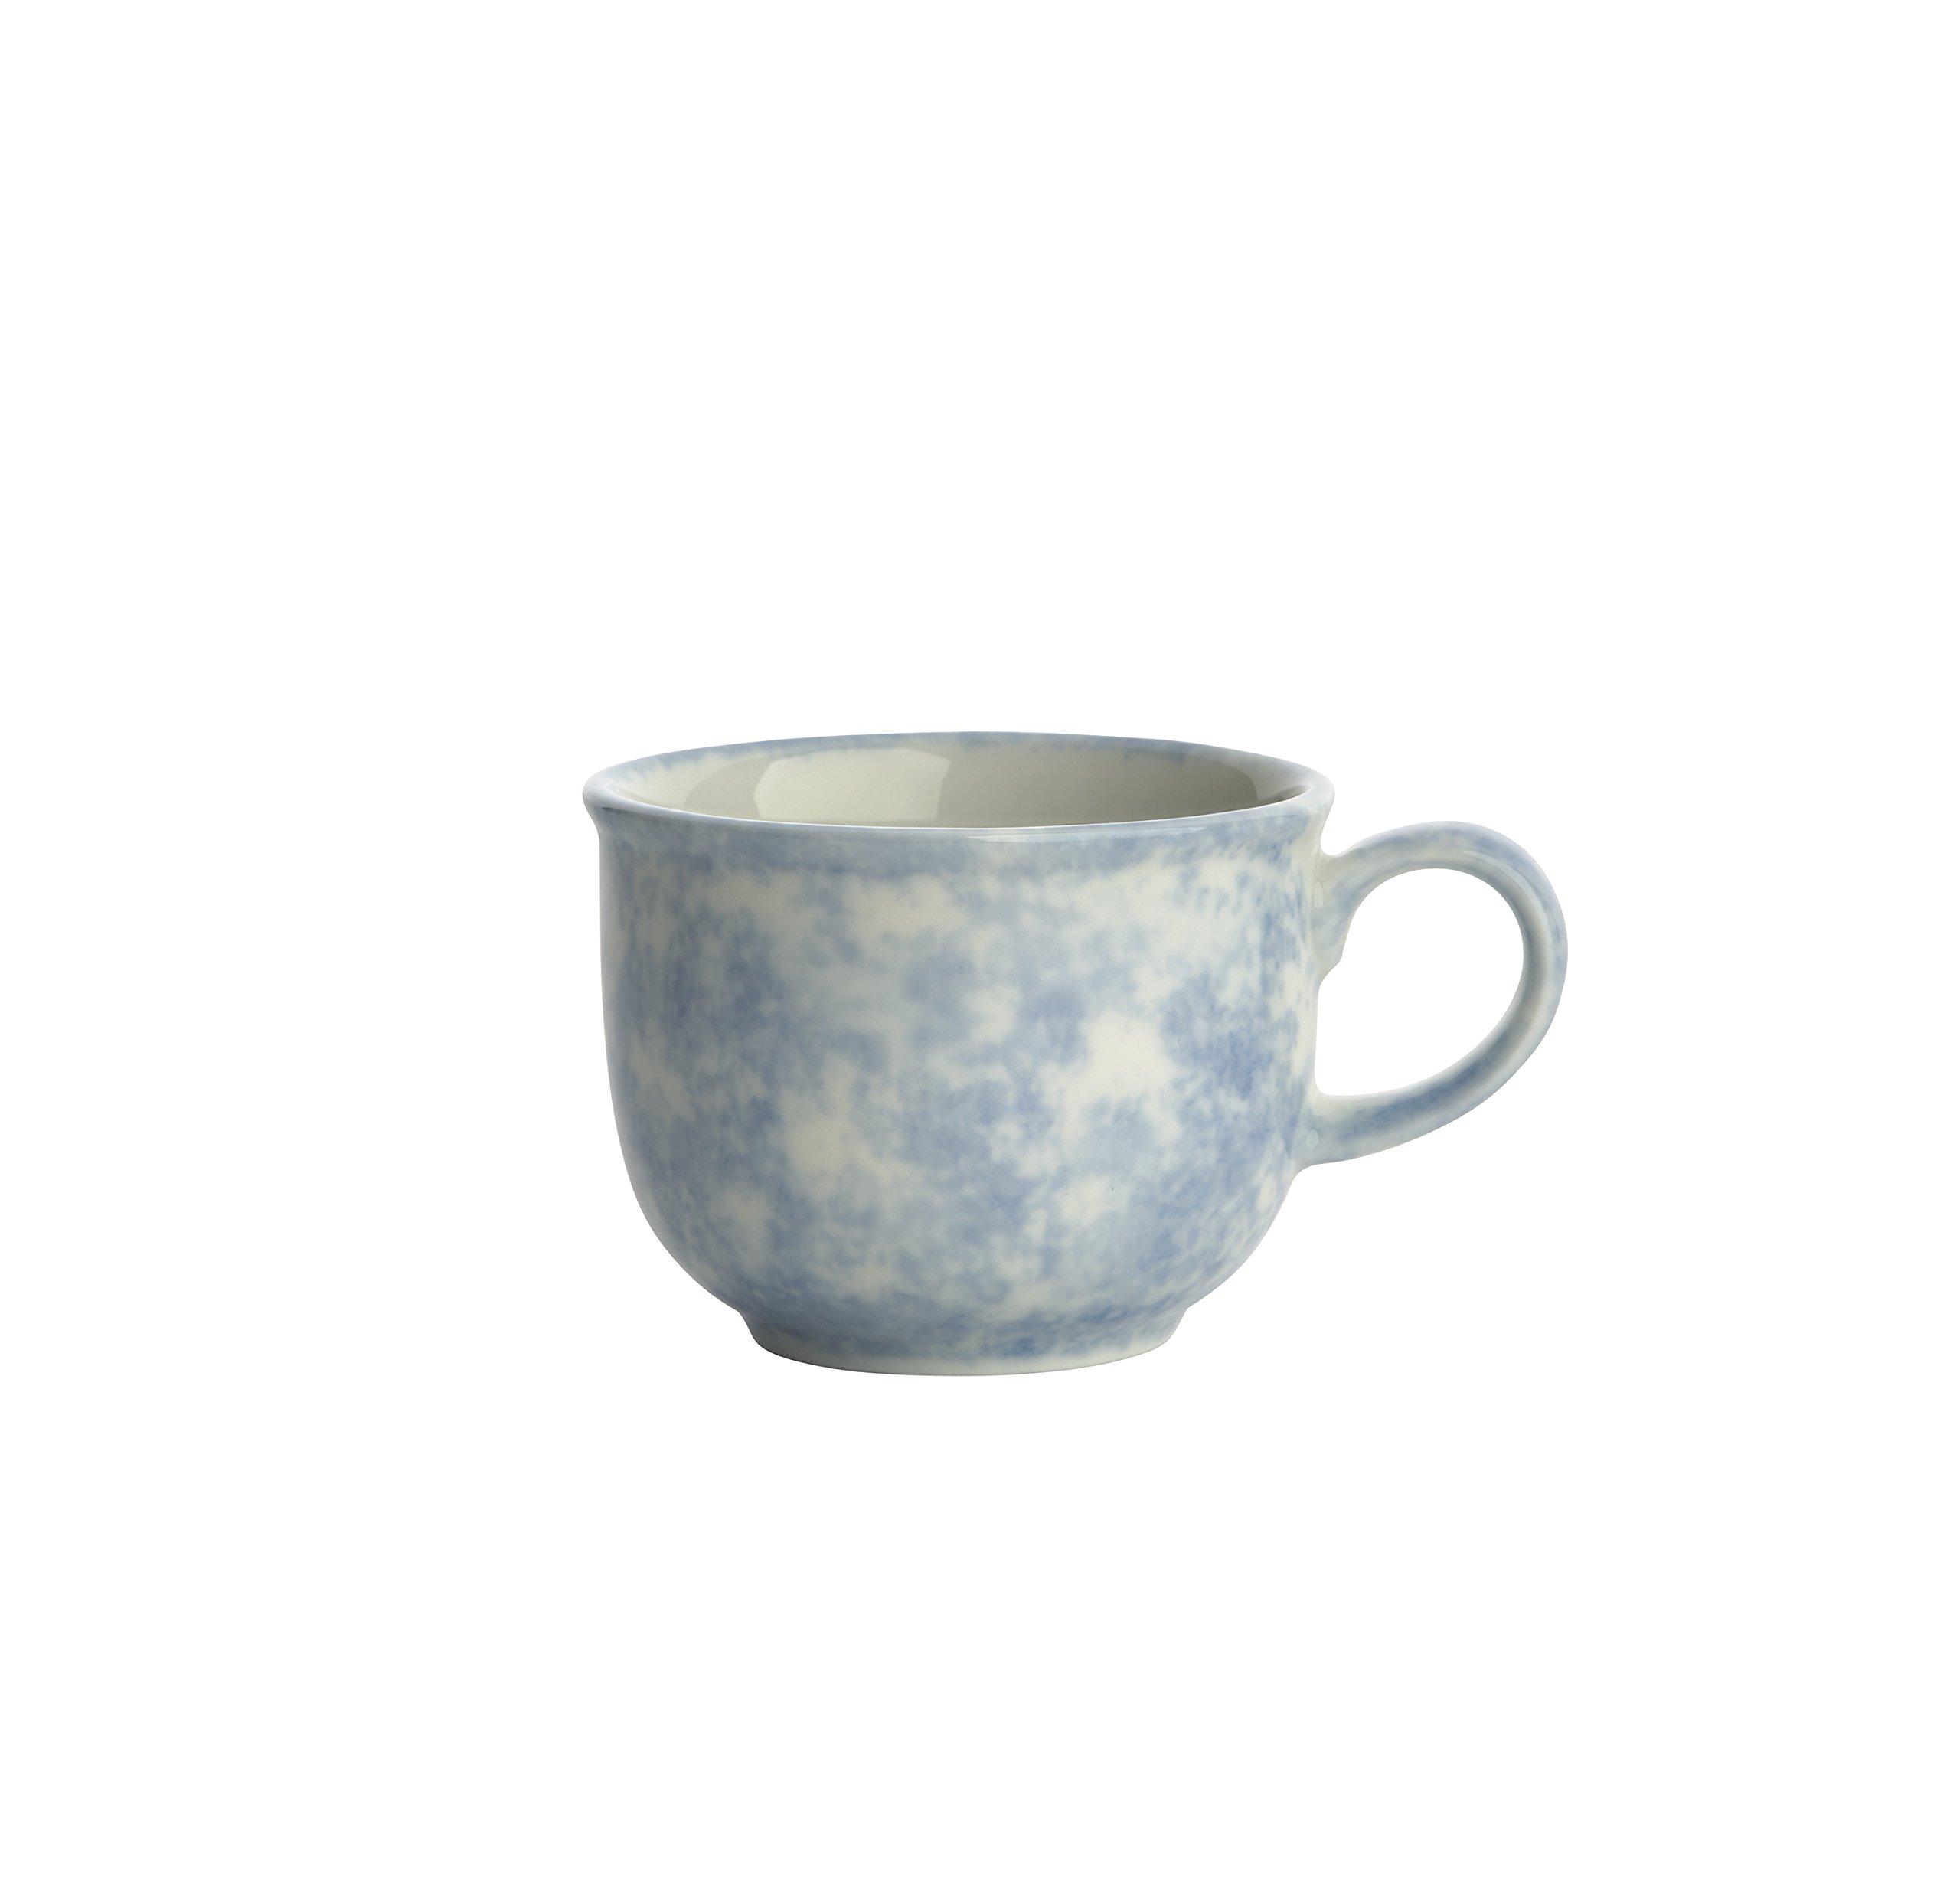 Oneida Foodservice F1463060525 Studio Pottery Cloud, 3.625 Oz, Set of 24, Cup